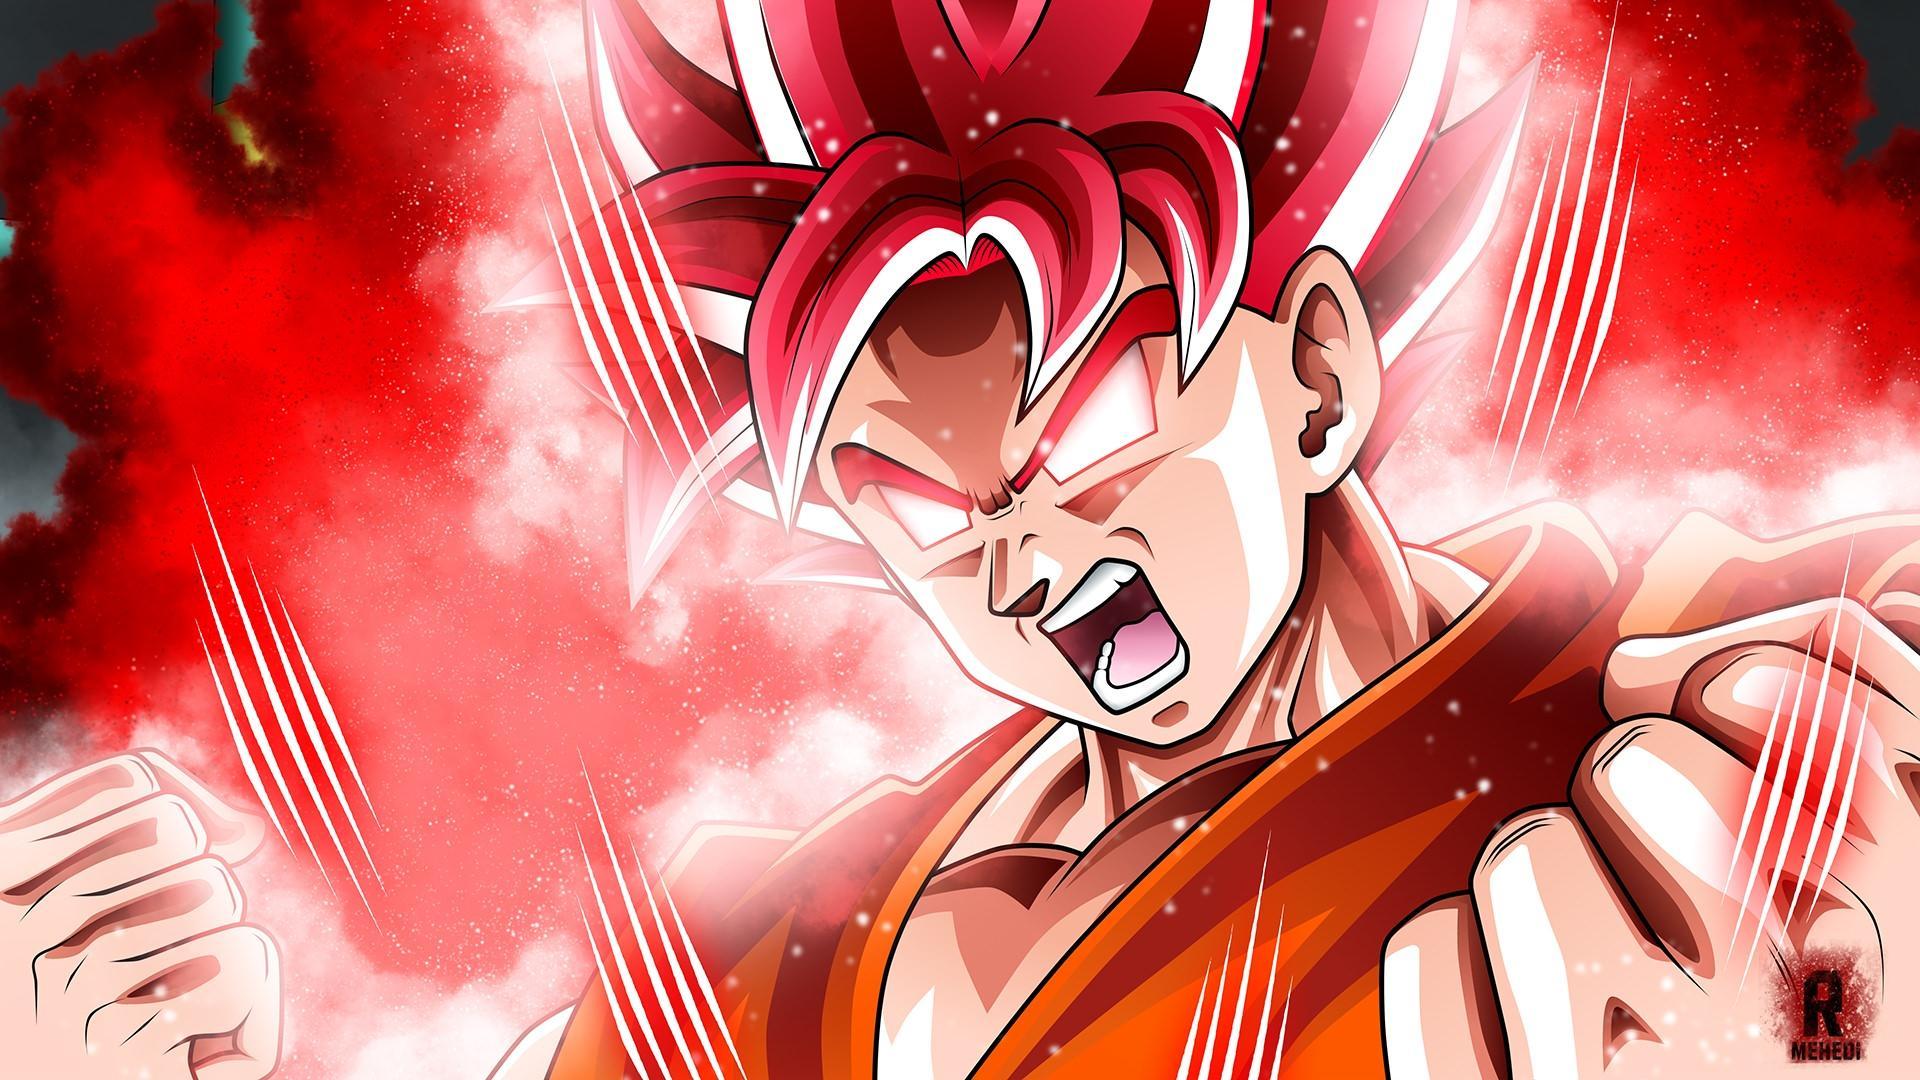 Goku Omni Super Saiyan Wallpapers Wallpaper Cave